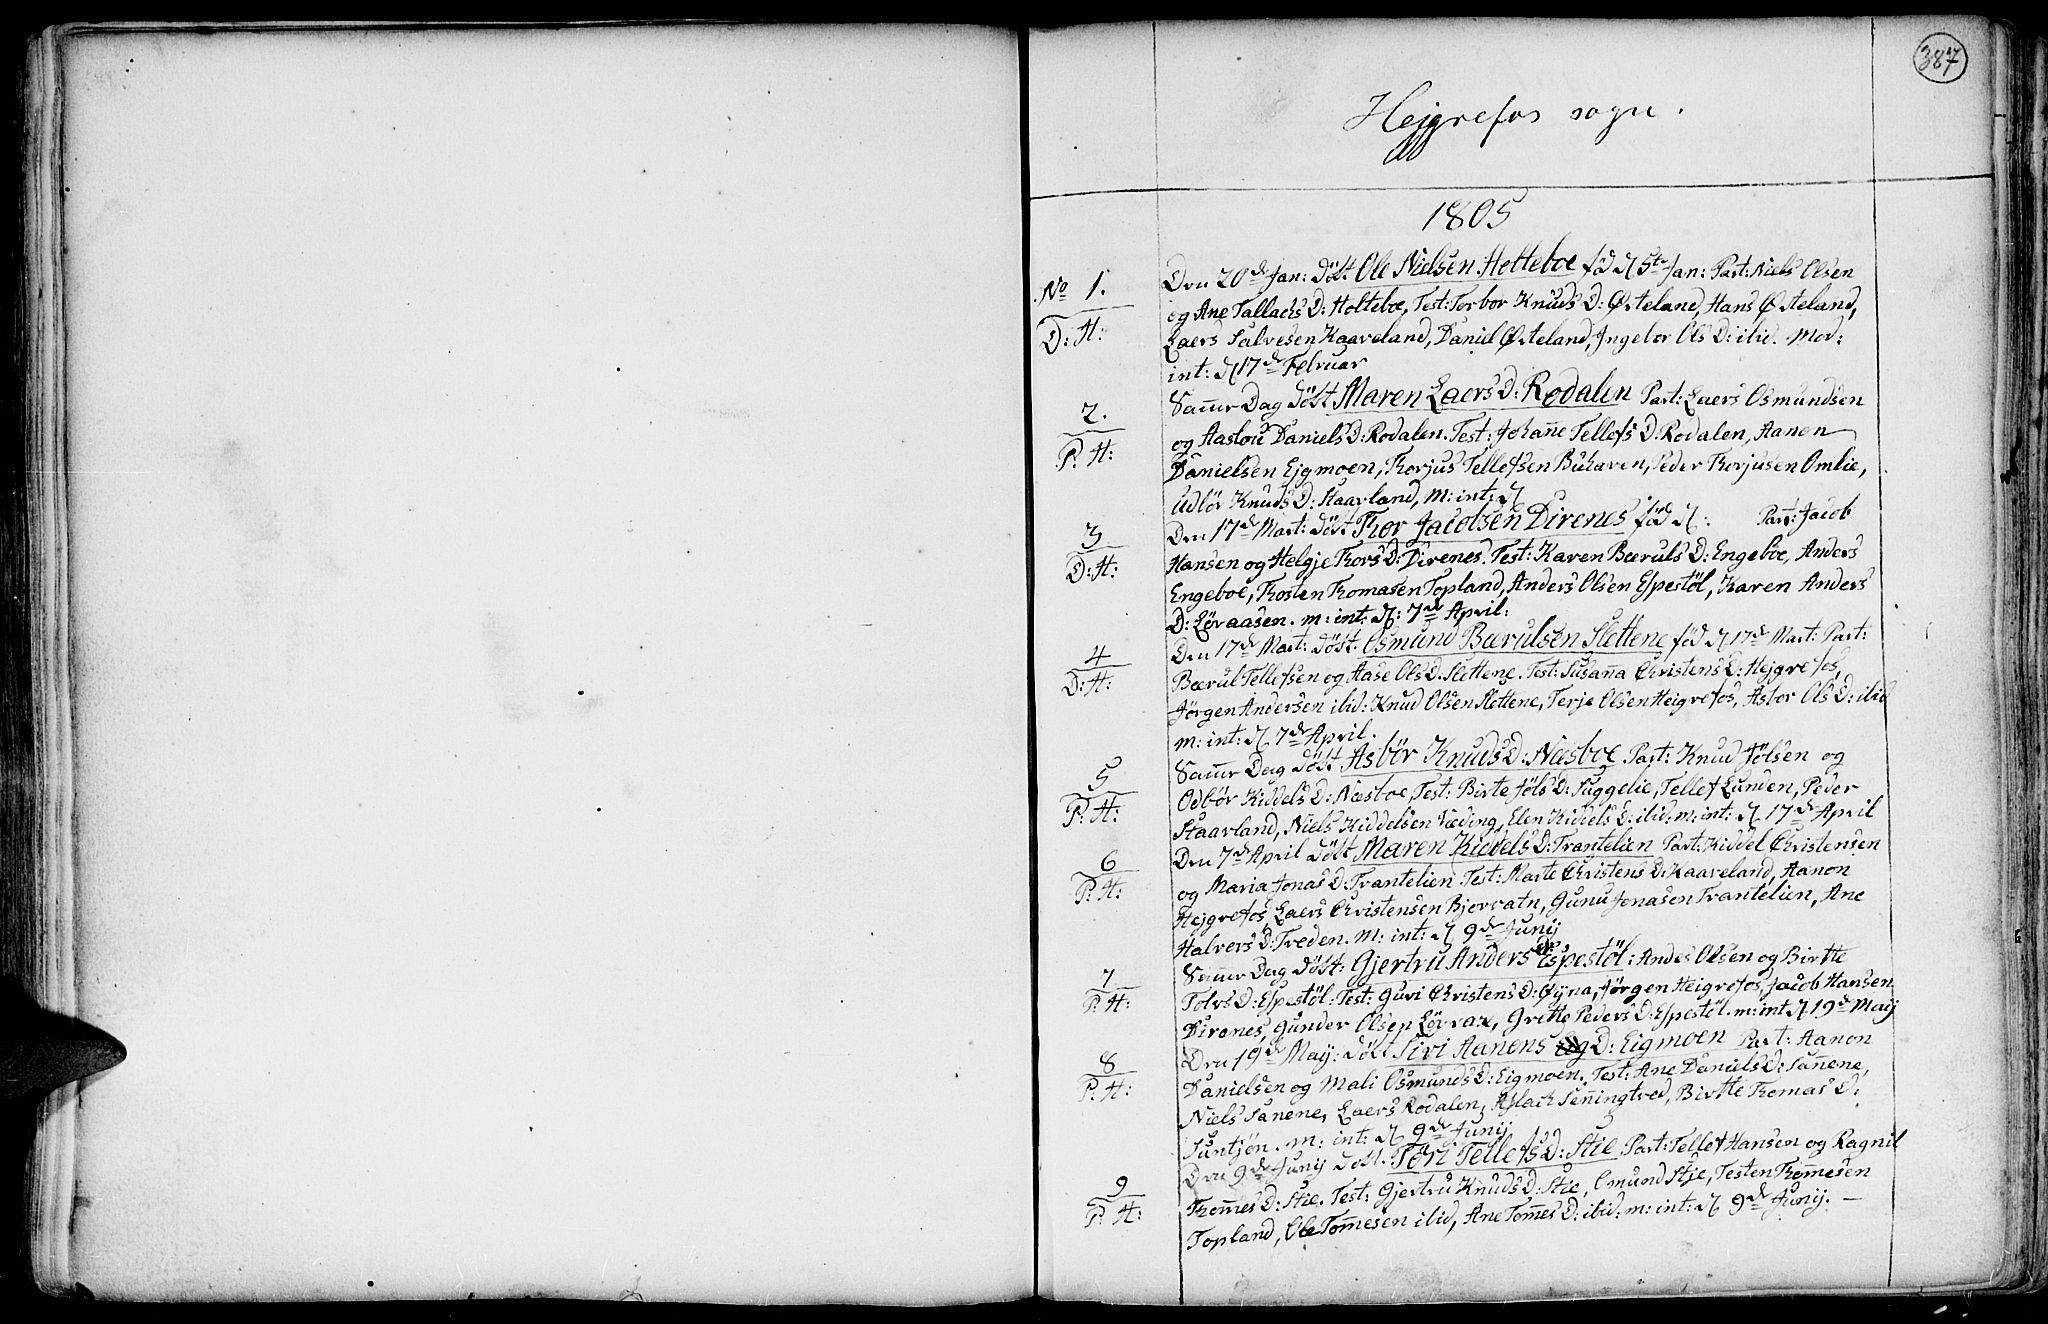 SAK, Hommedal sokneprestkontor, F/Fa/Fab/L0002: Ministerialbok nr. A 2 /3, 1740-1821, s. 387